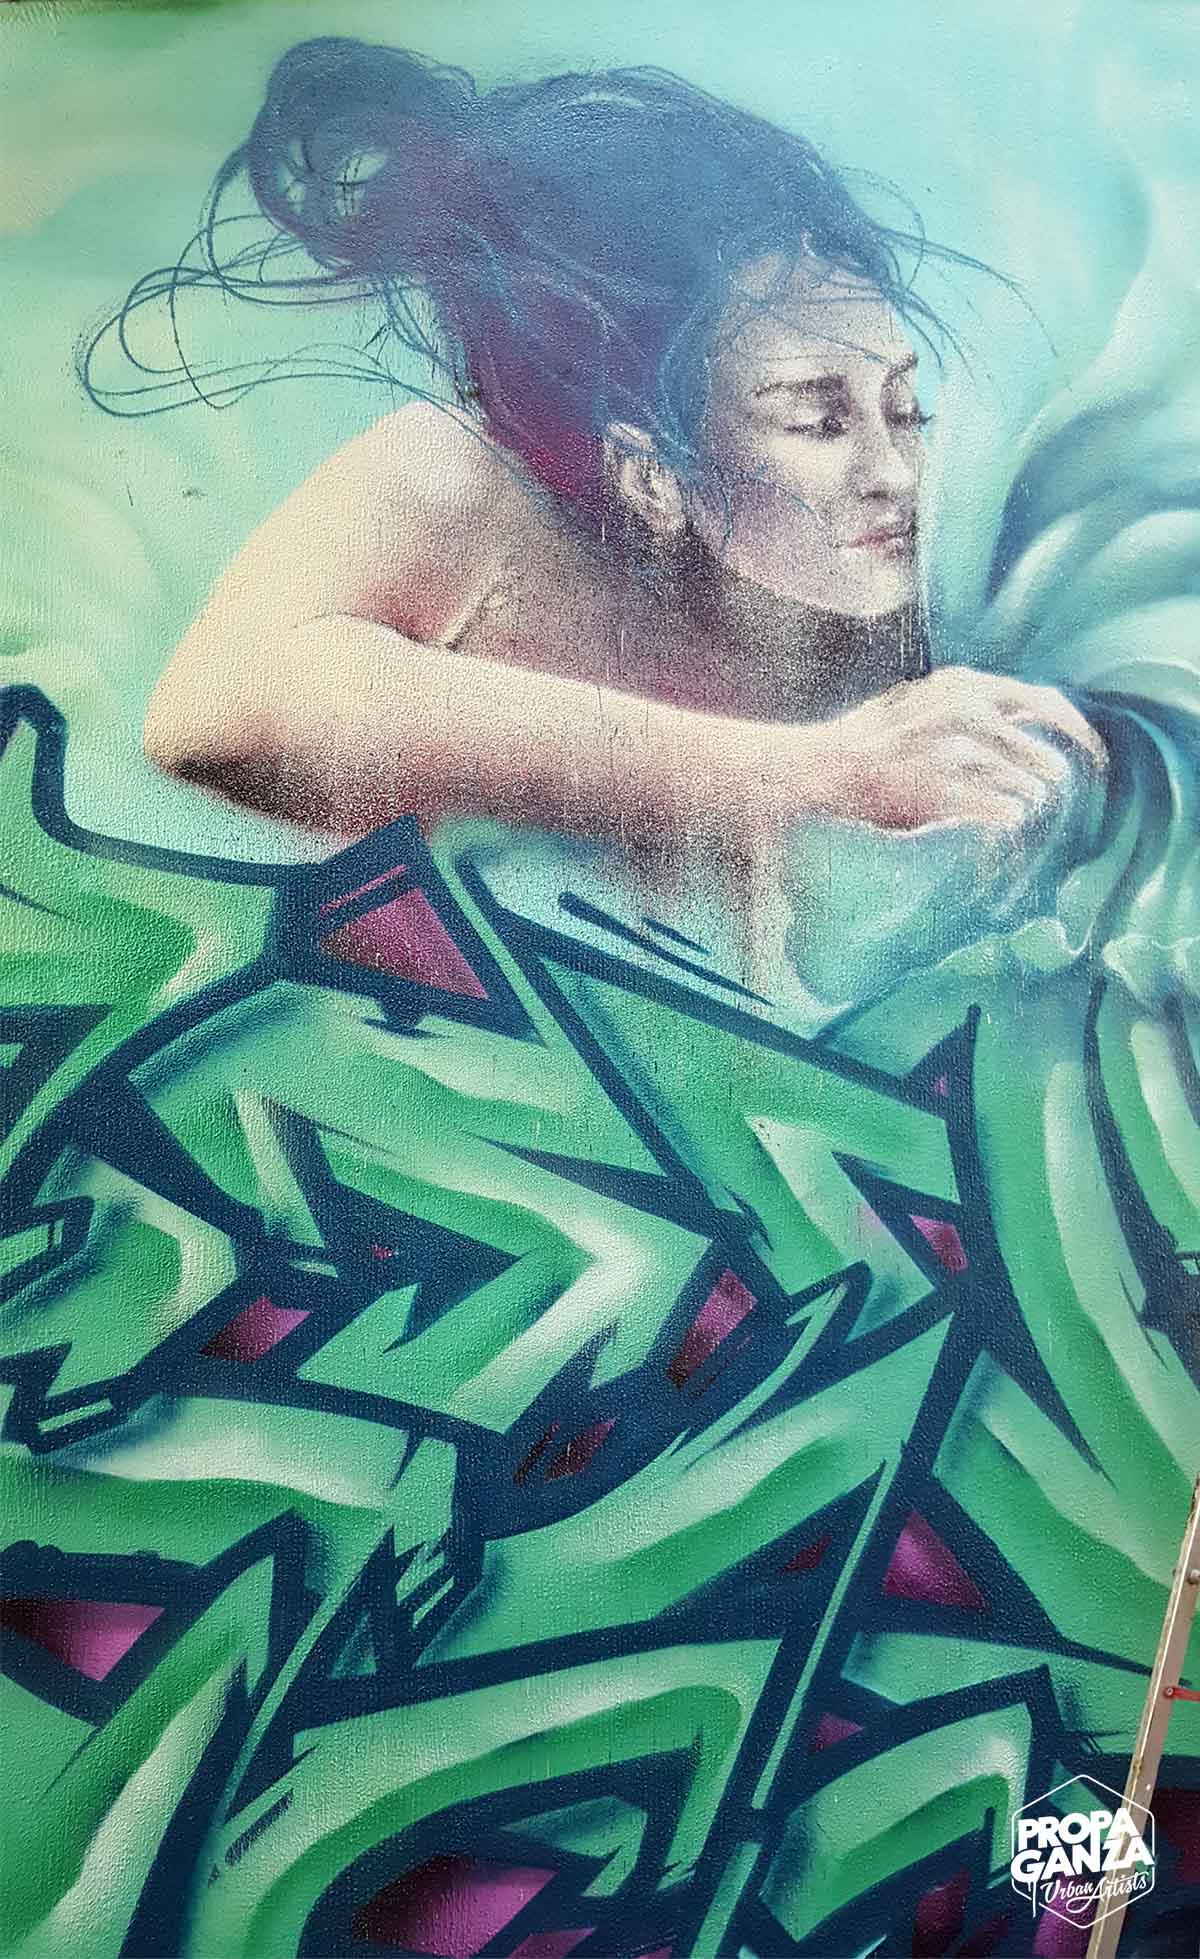 https://www.propaganza.be/wp-content/uploads/2019/04/propaganza-begium-bruxelles-couleur-cafe-artist-graffiti-street-art-spray-live-painting-iota-trevor-2018-1.jpg